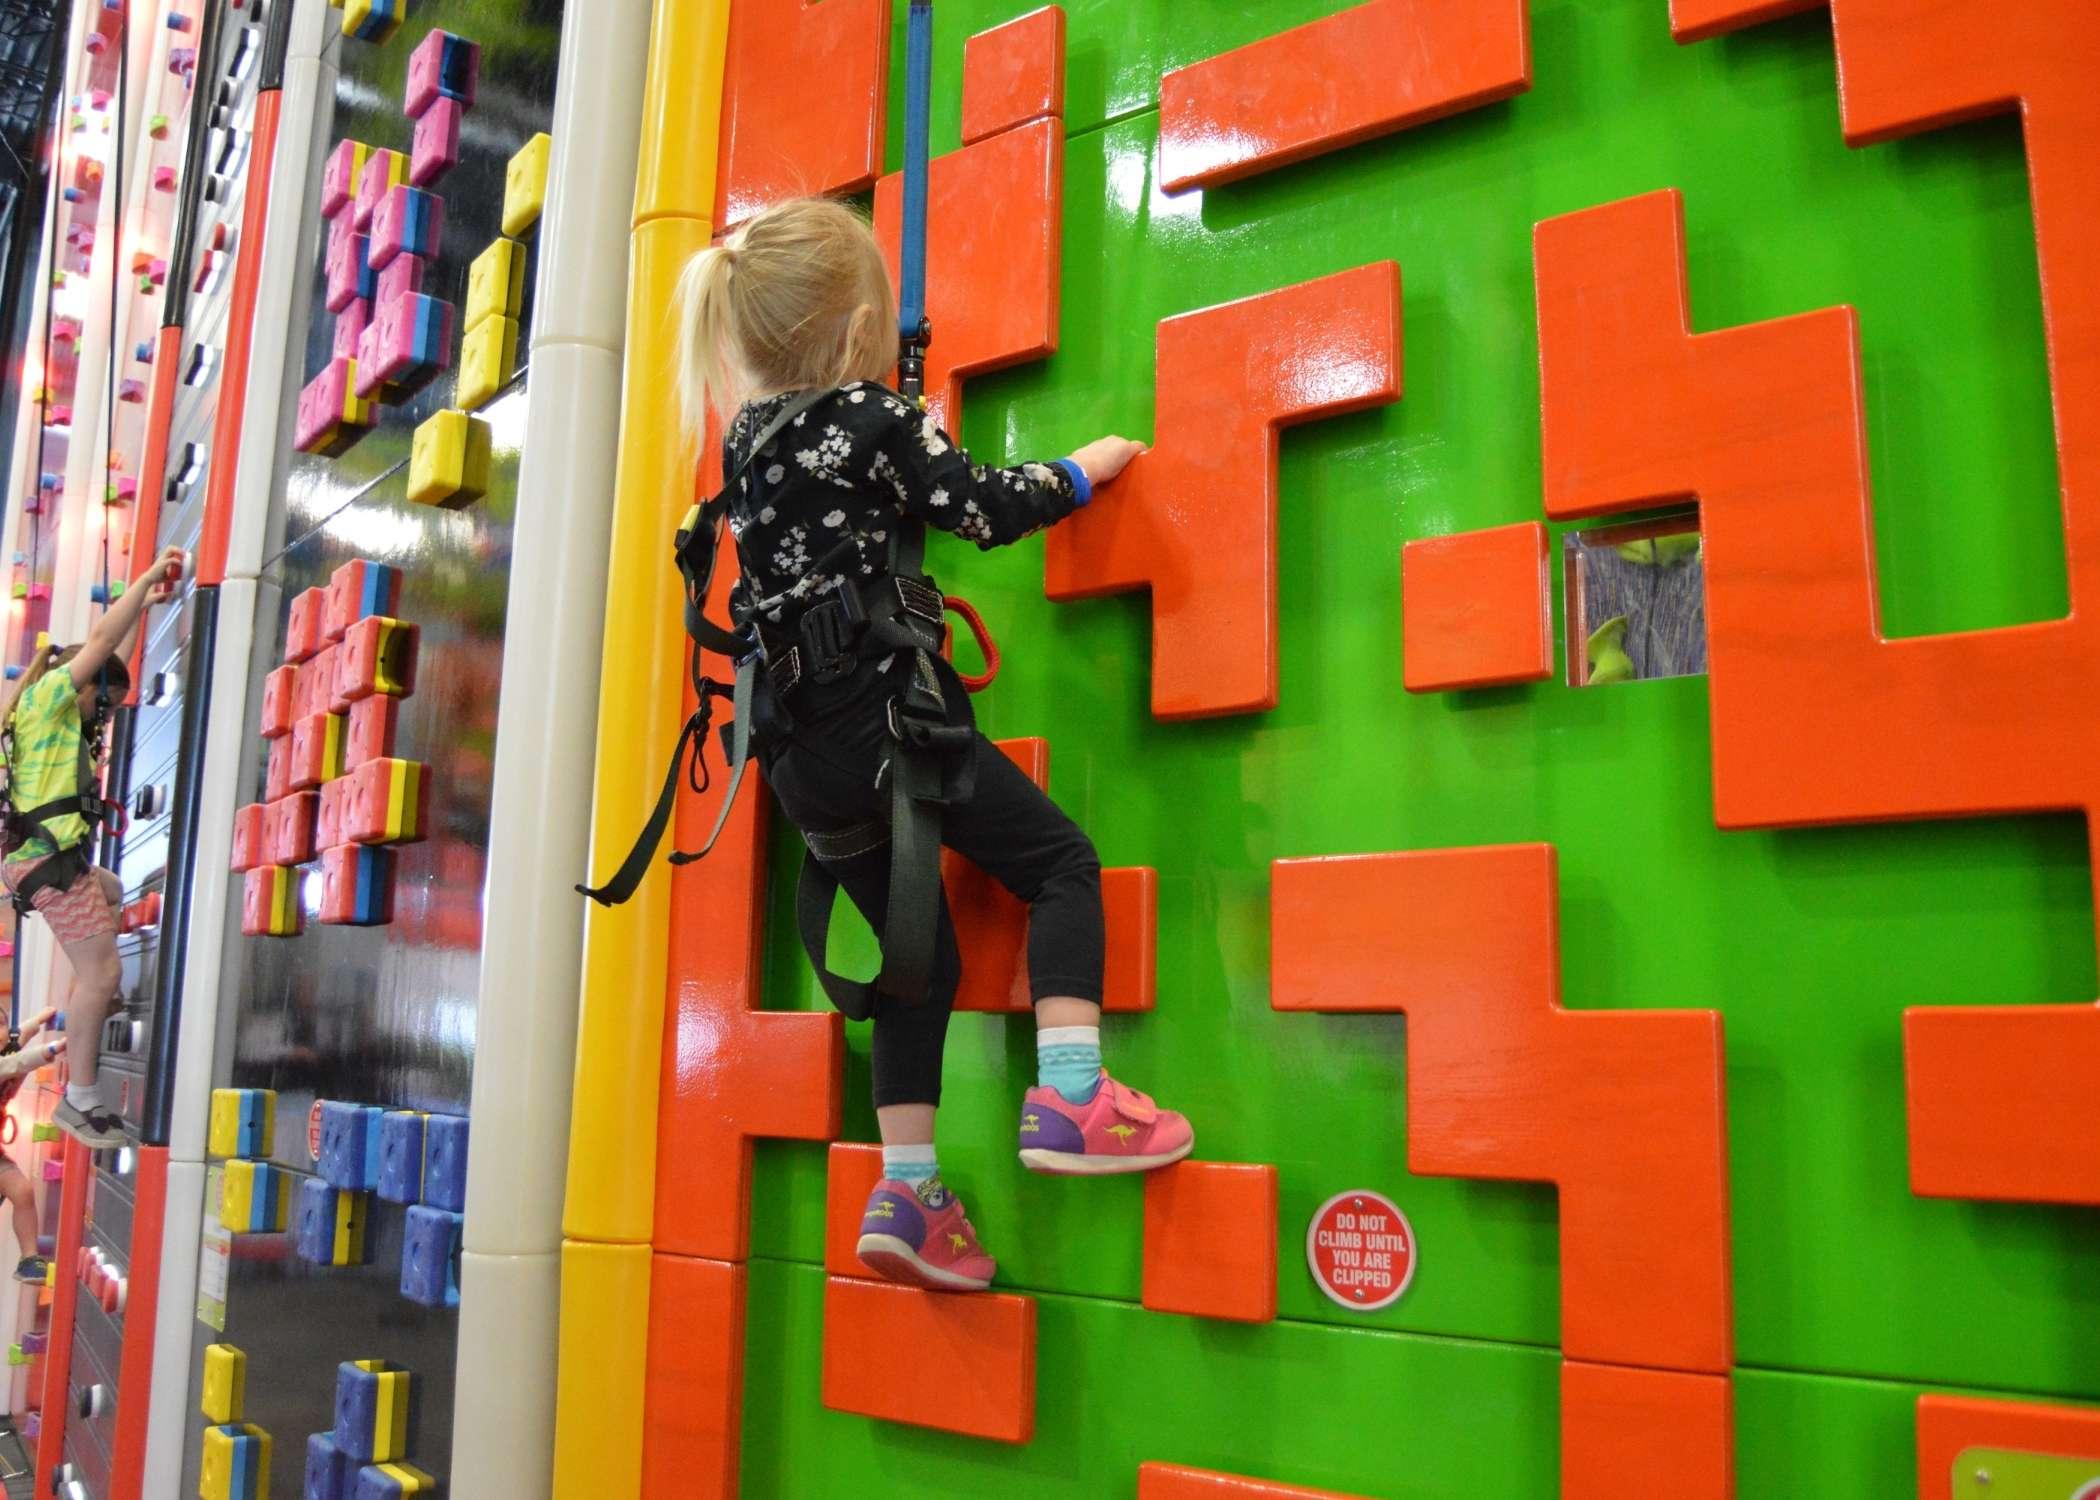 clip n climb, install clip and climb